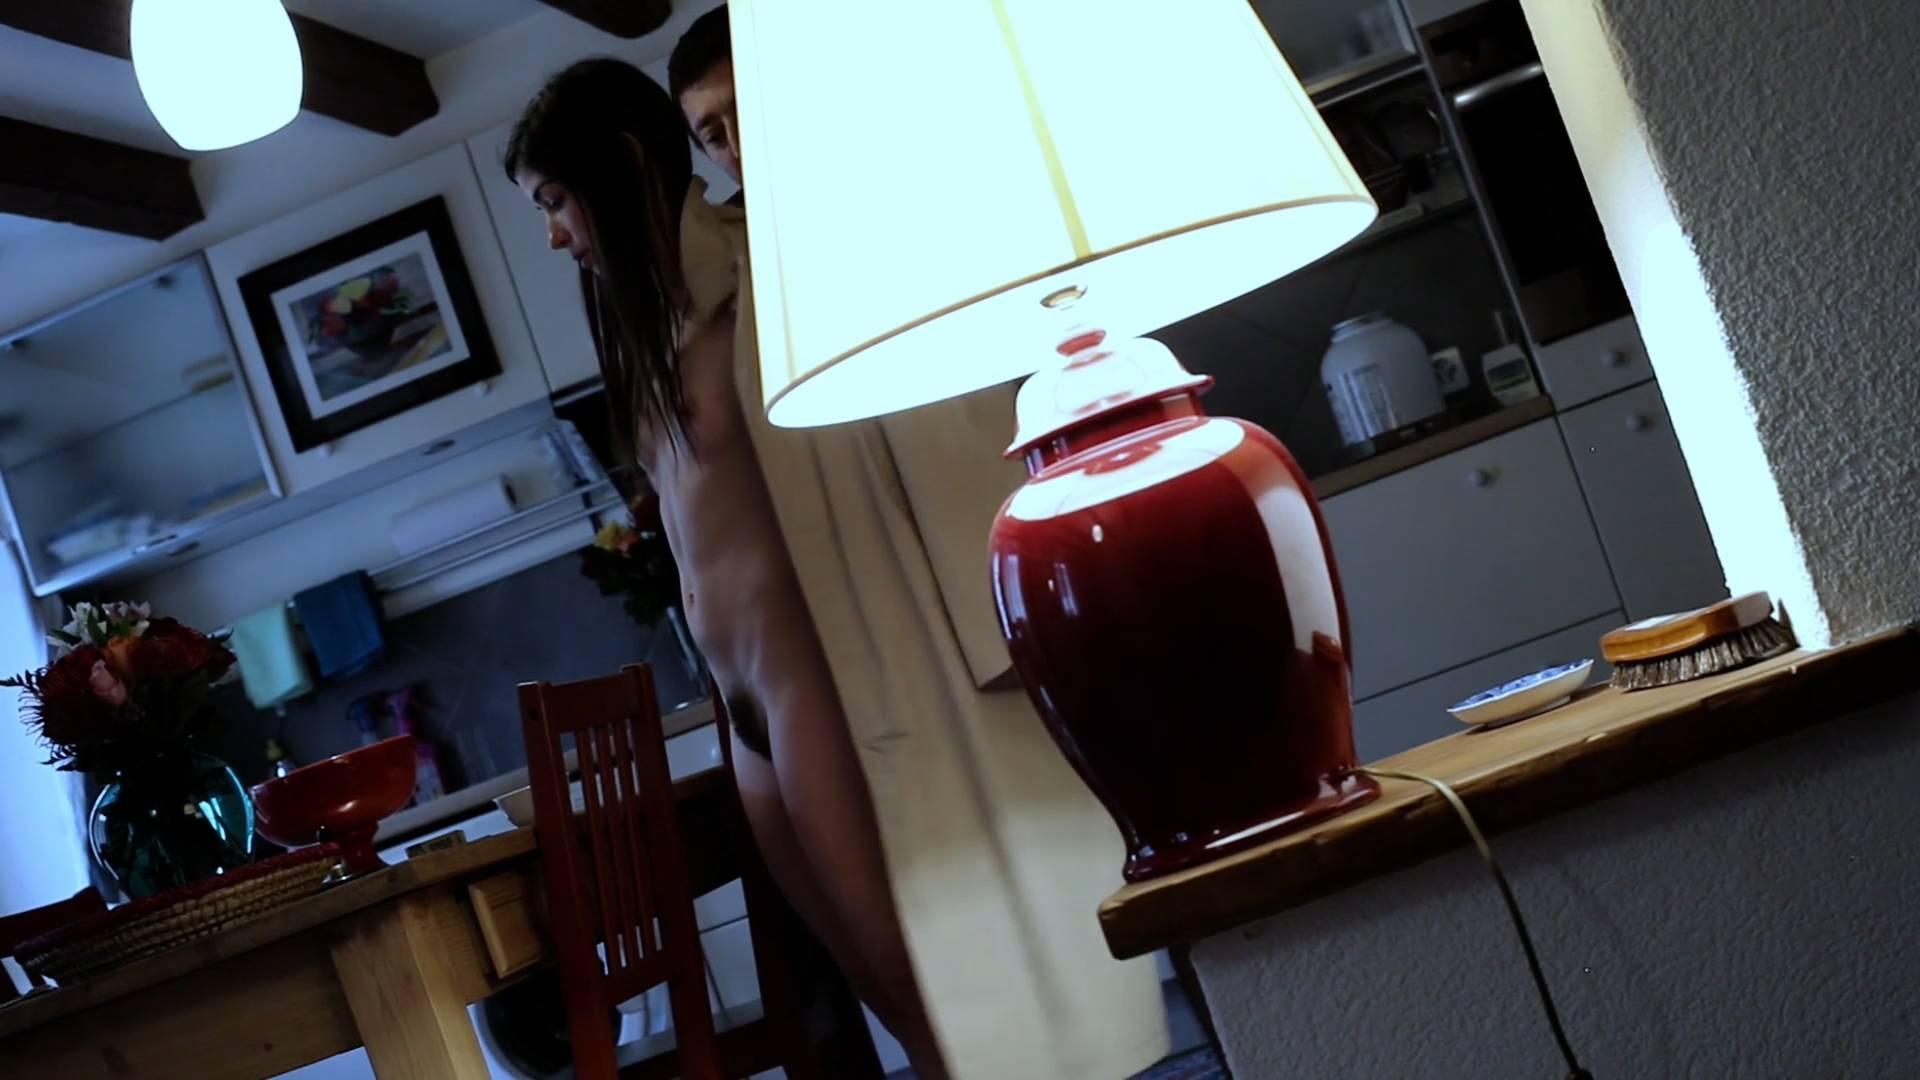 Zoé Bruneau nude full frontal and explicit sex - Adieu Au Langage (FR-2014) 1080p (14)